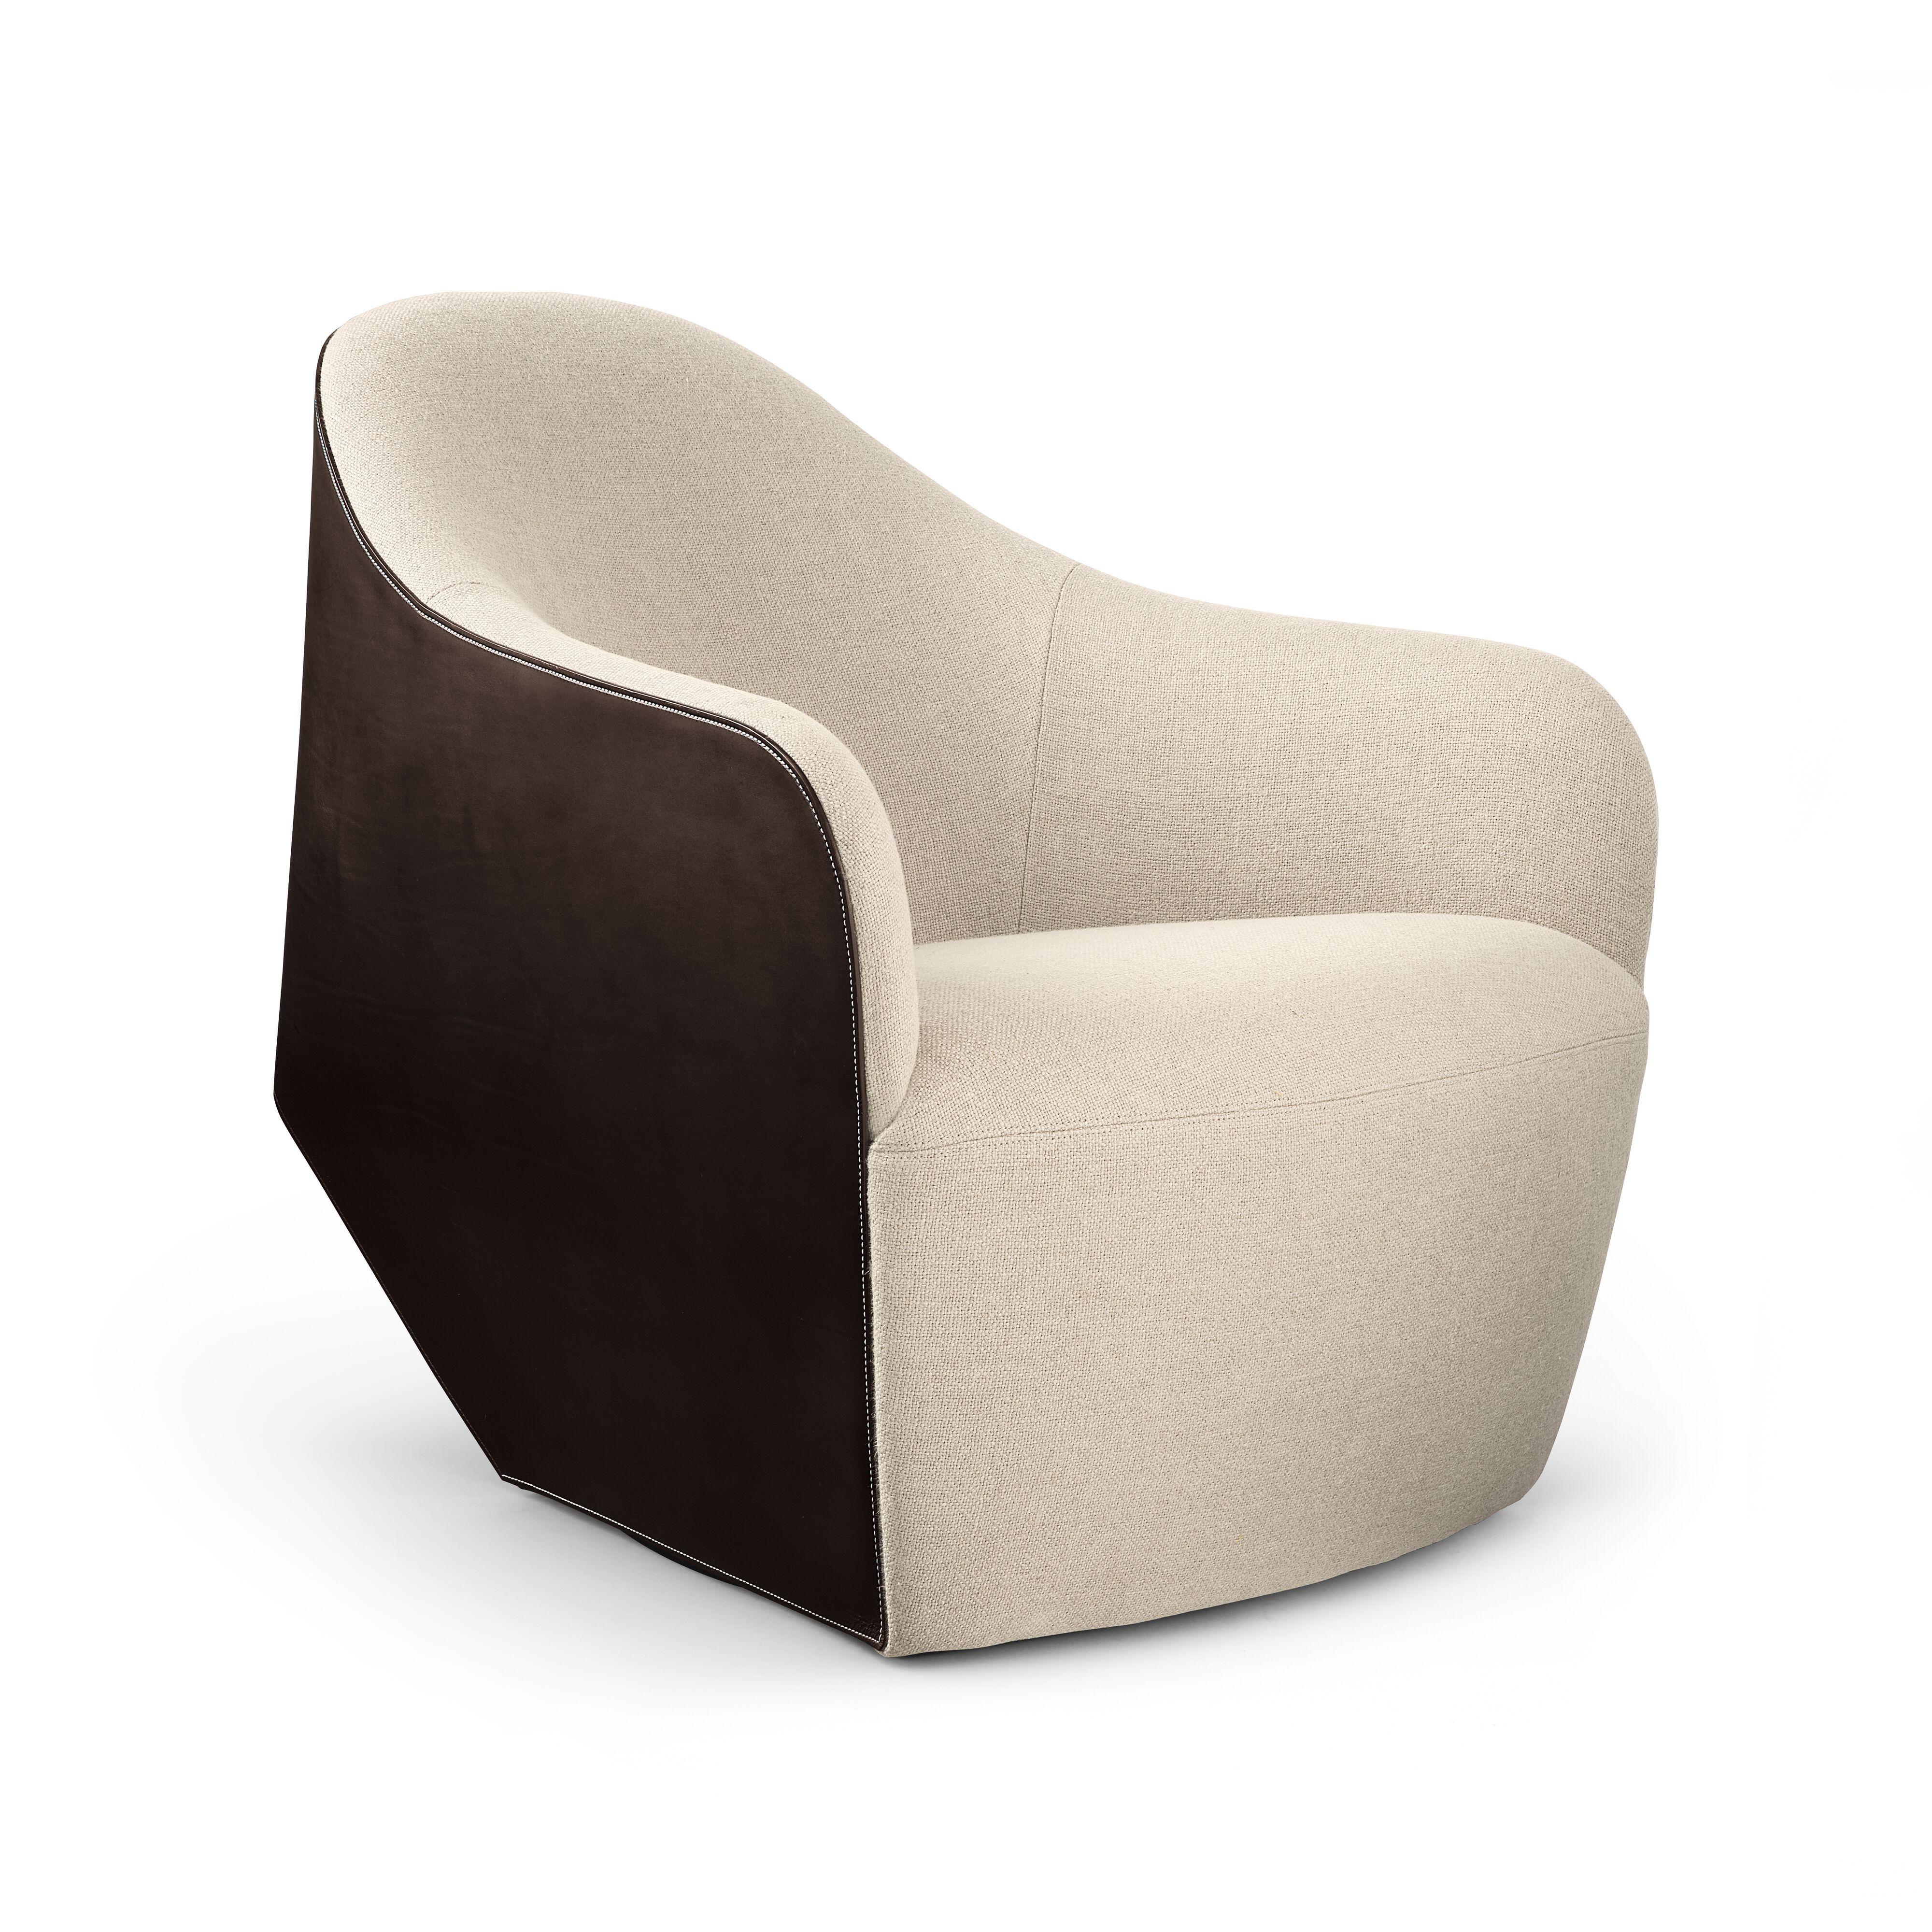 01-WK-Isanka-Chair-0001-H.tif